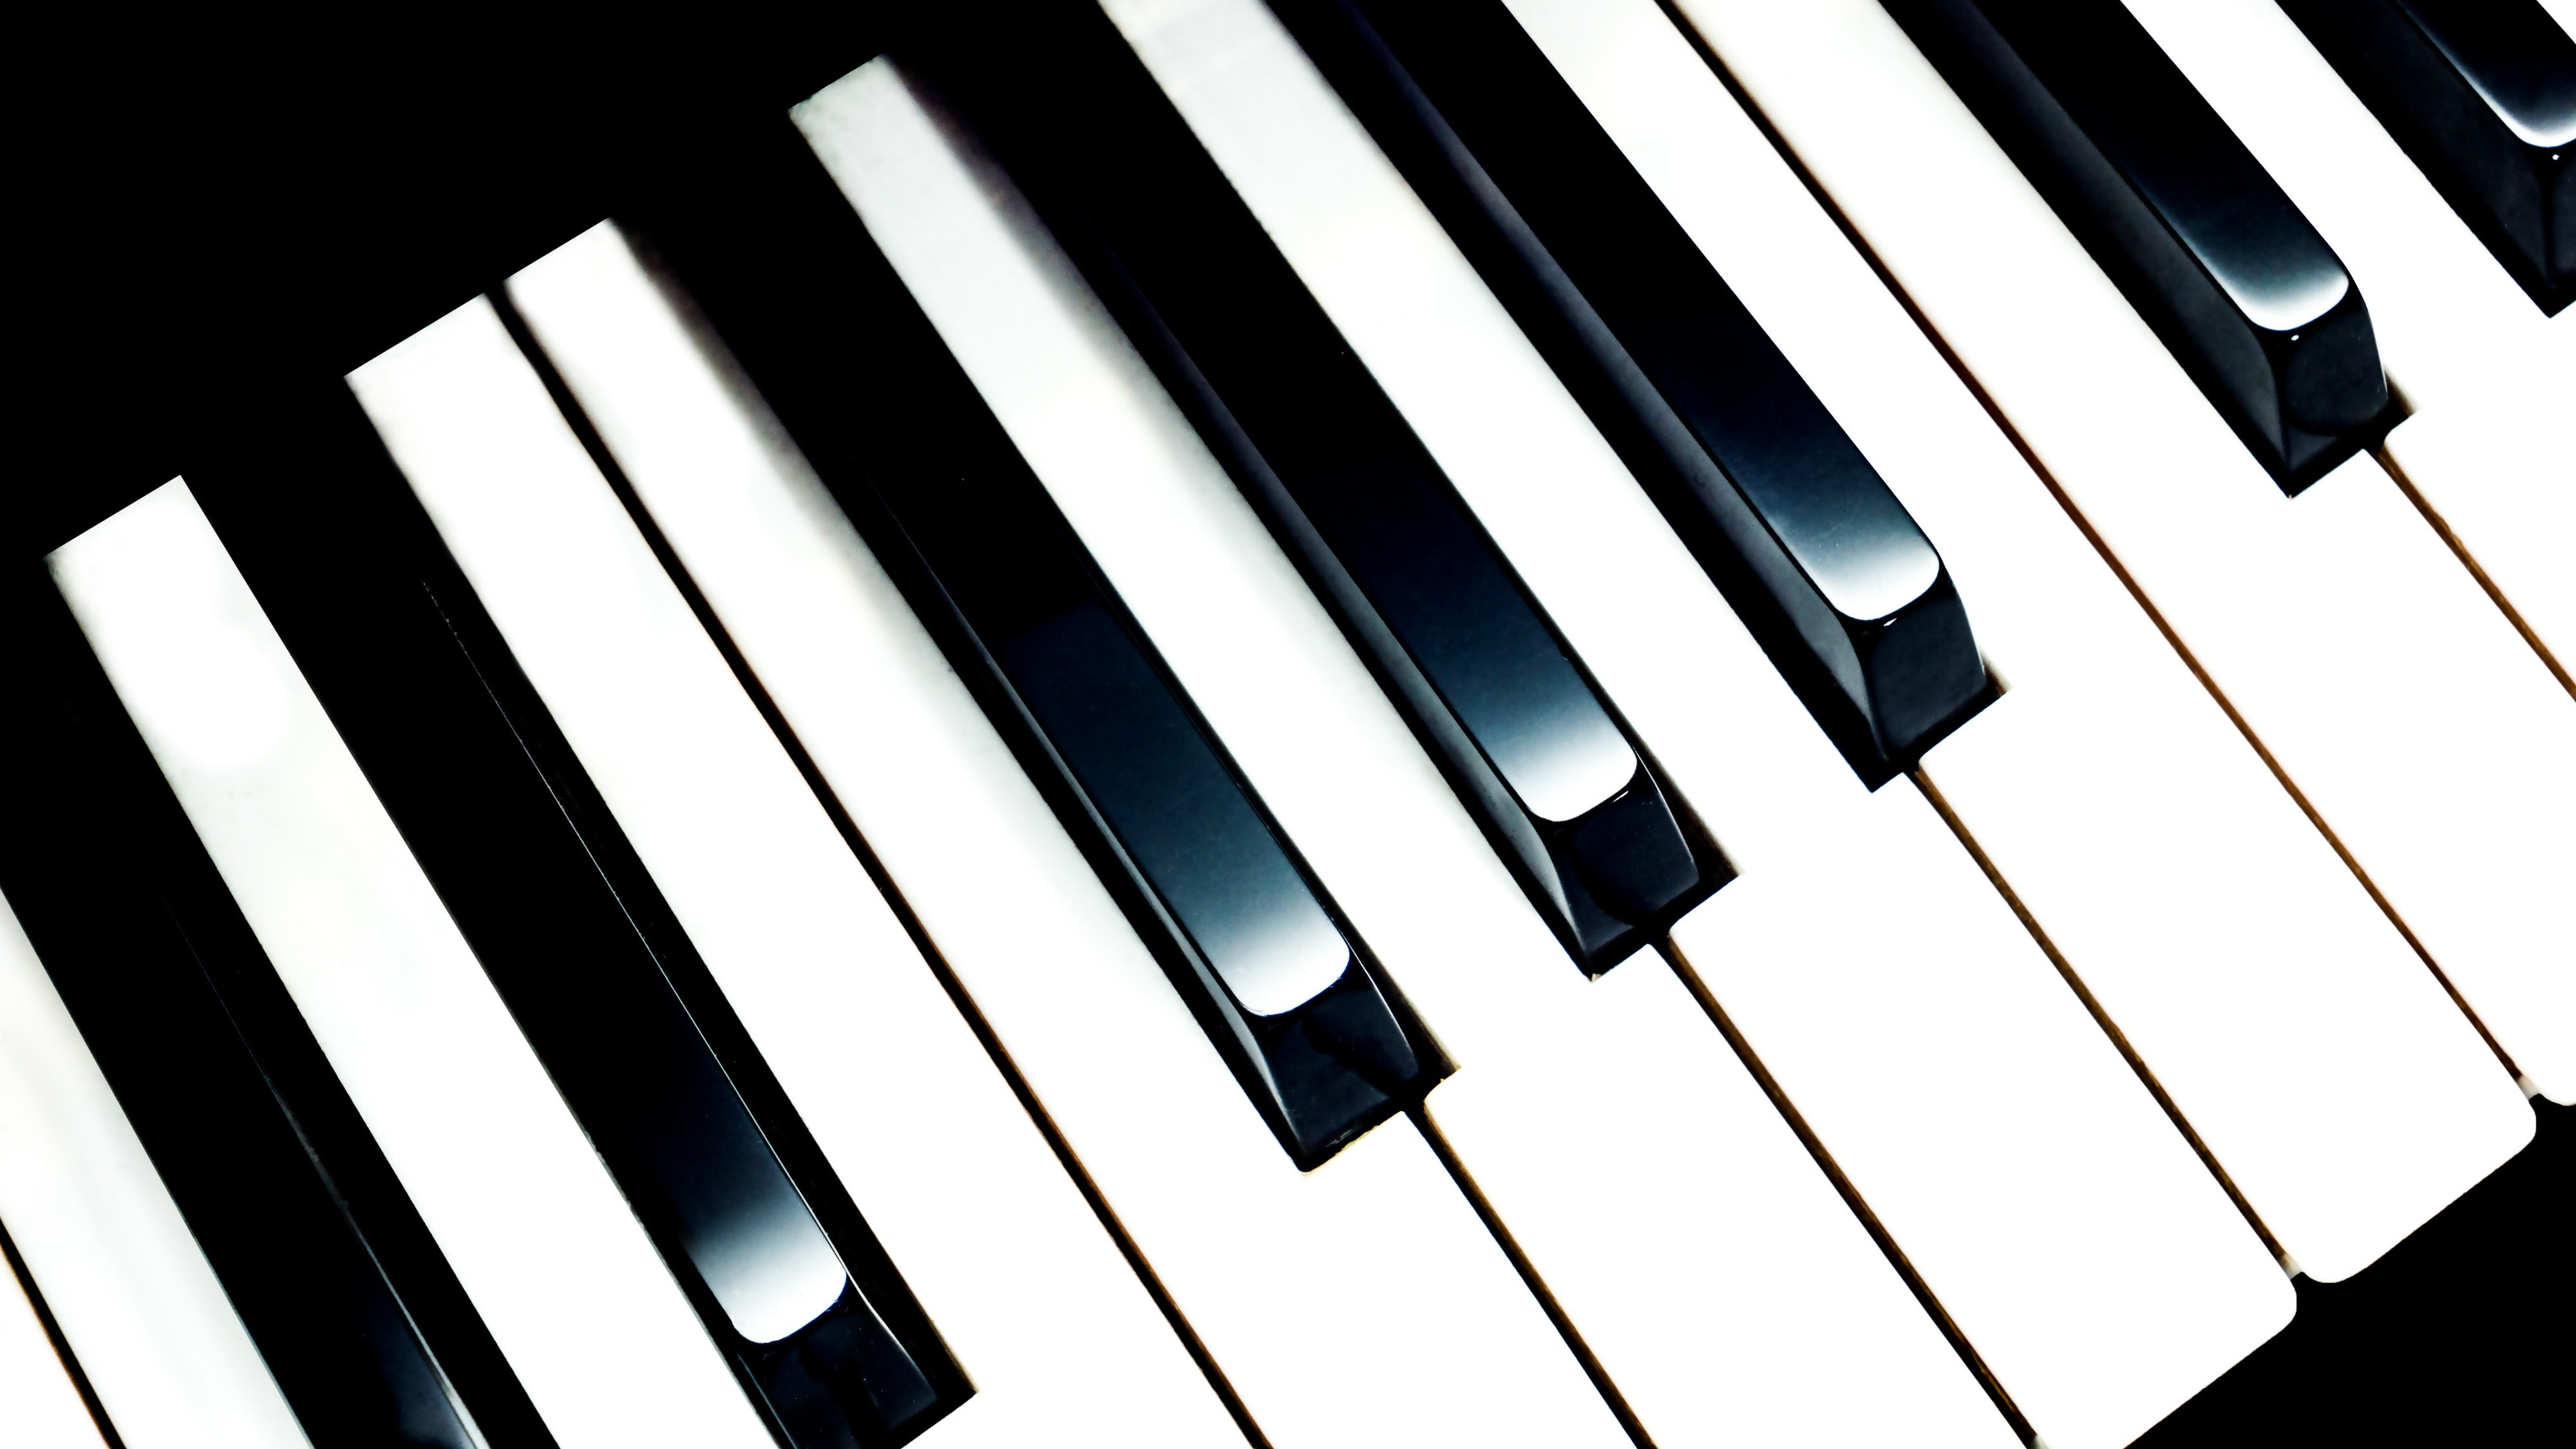 Music Instrument Piano Keys free image